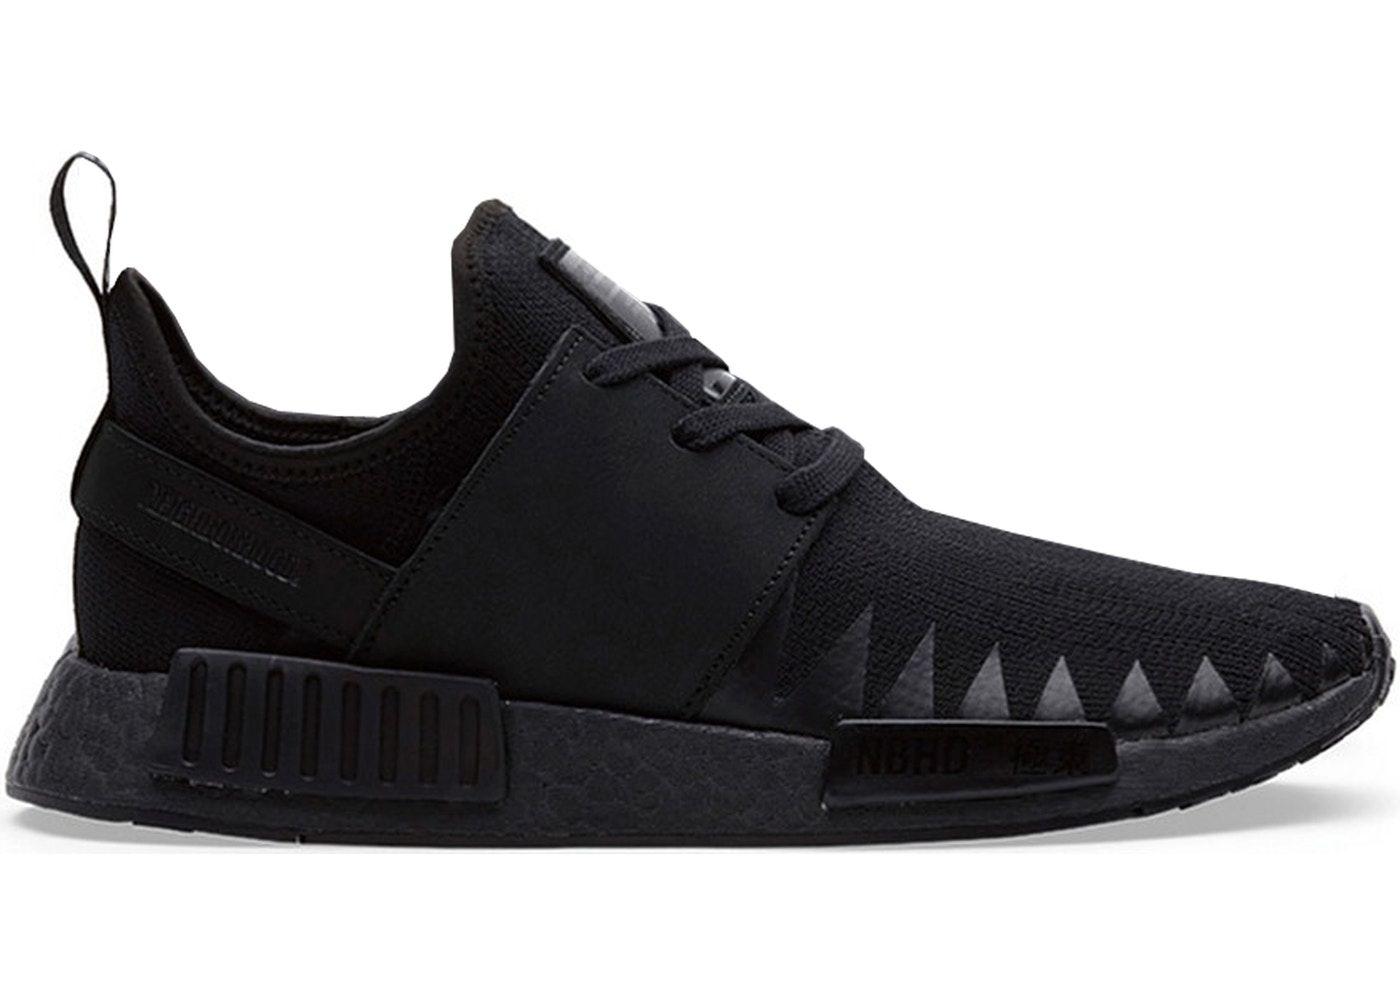 Adidas Nmd R1 Neighborhood Triple Black Adidas Nmd R1 Adidas Black Shoes Sneakers